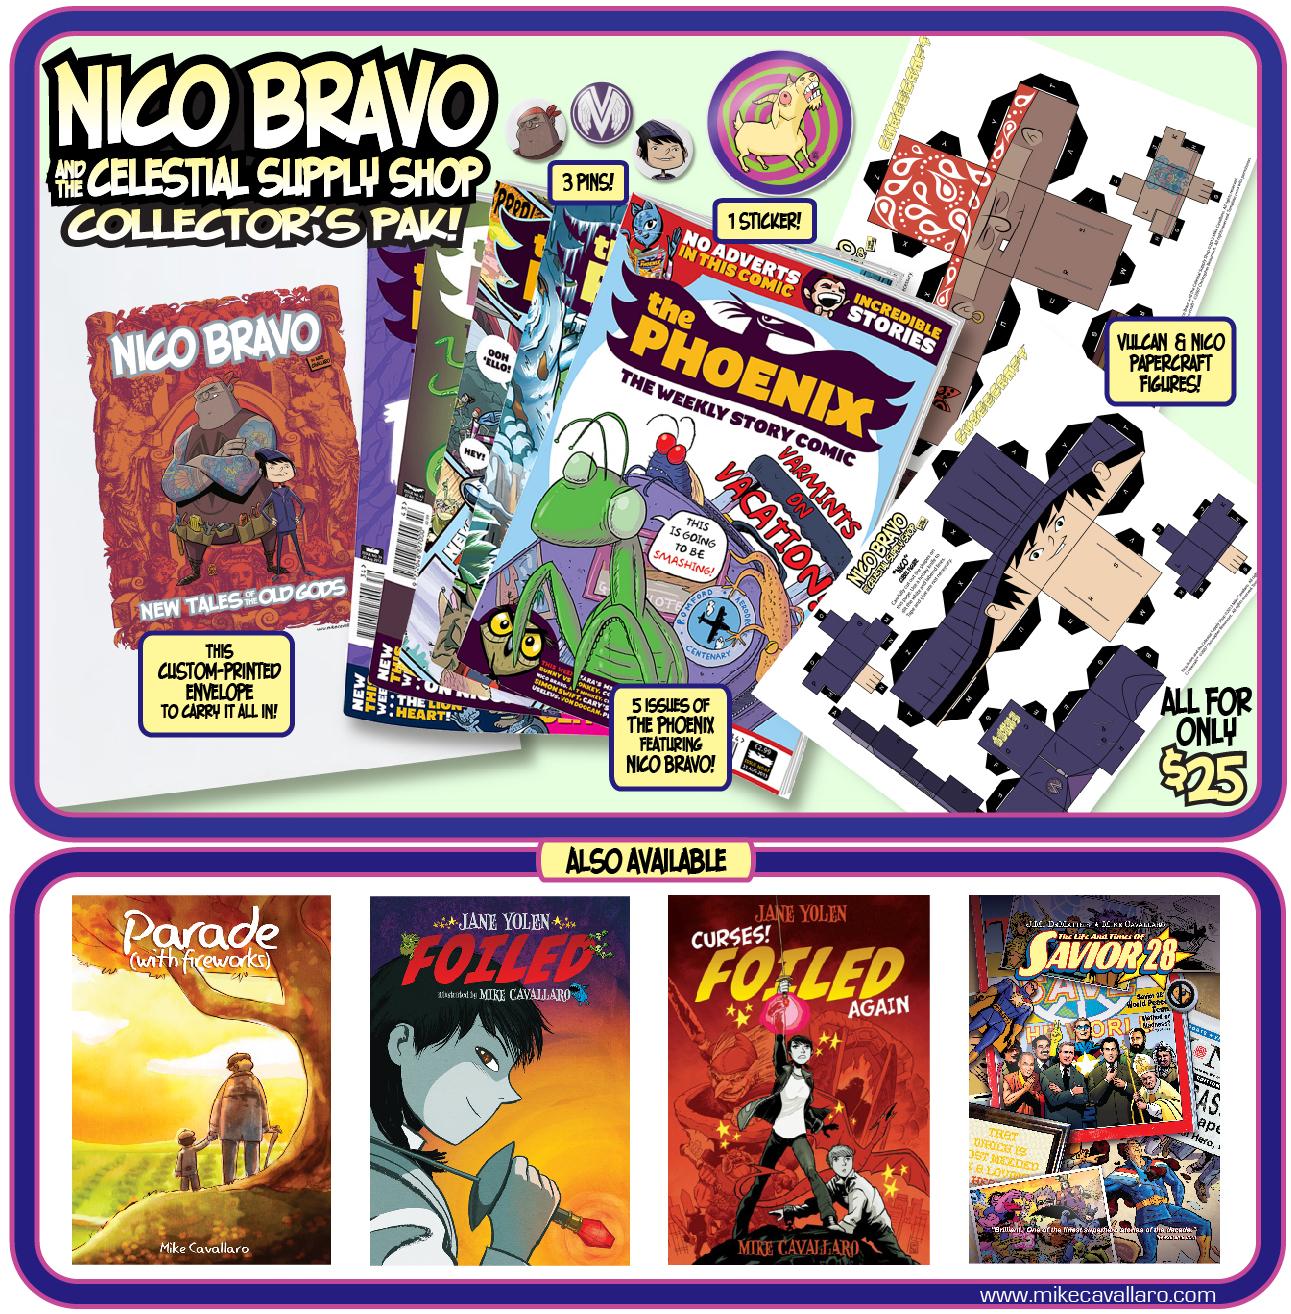 @ The Massachusetts Independent Comics Expo   Mike Cavallaro